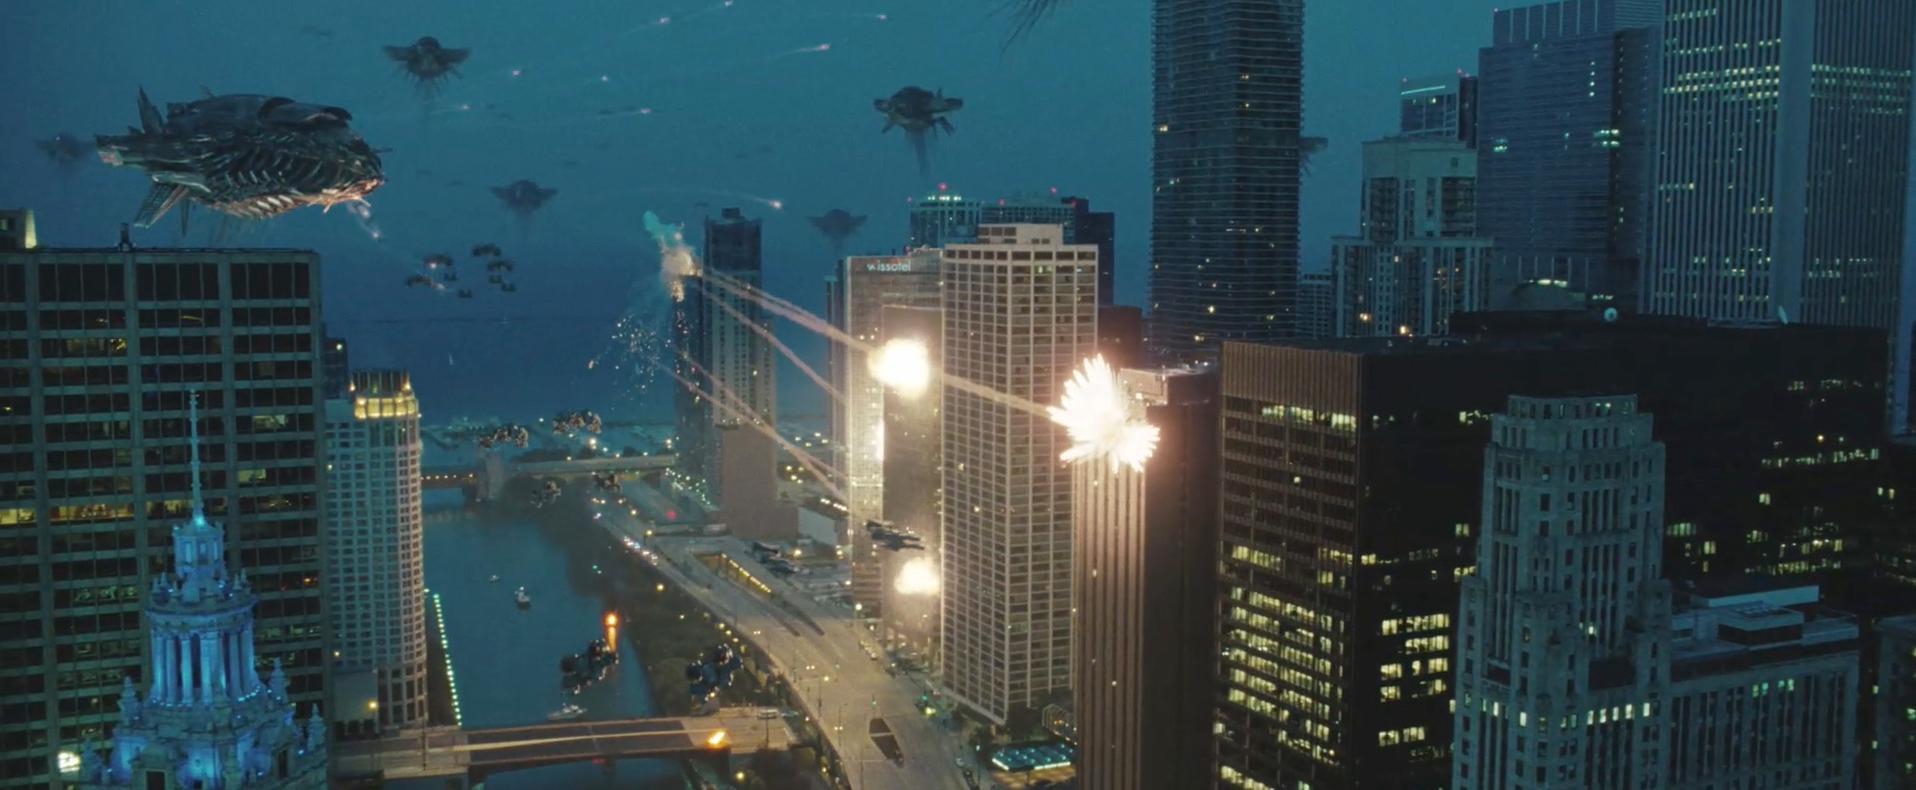 transformers-chicago.jpg